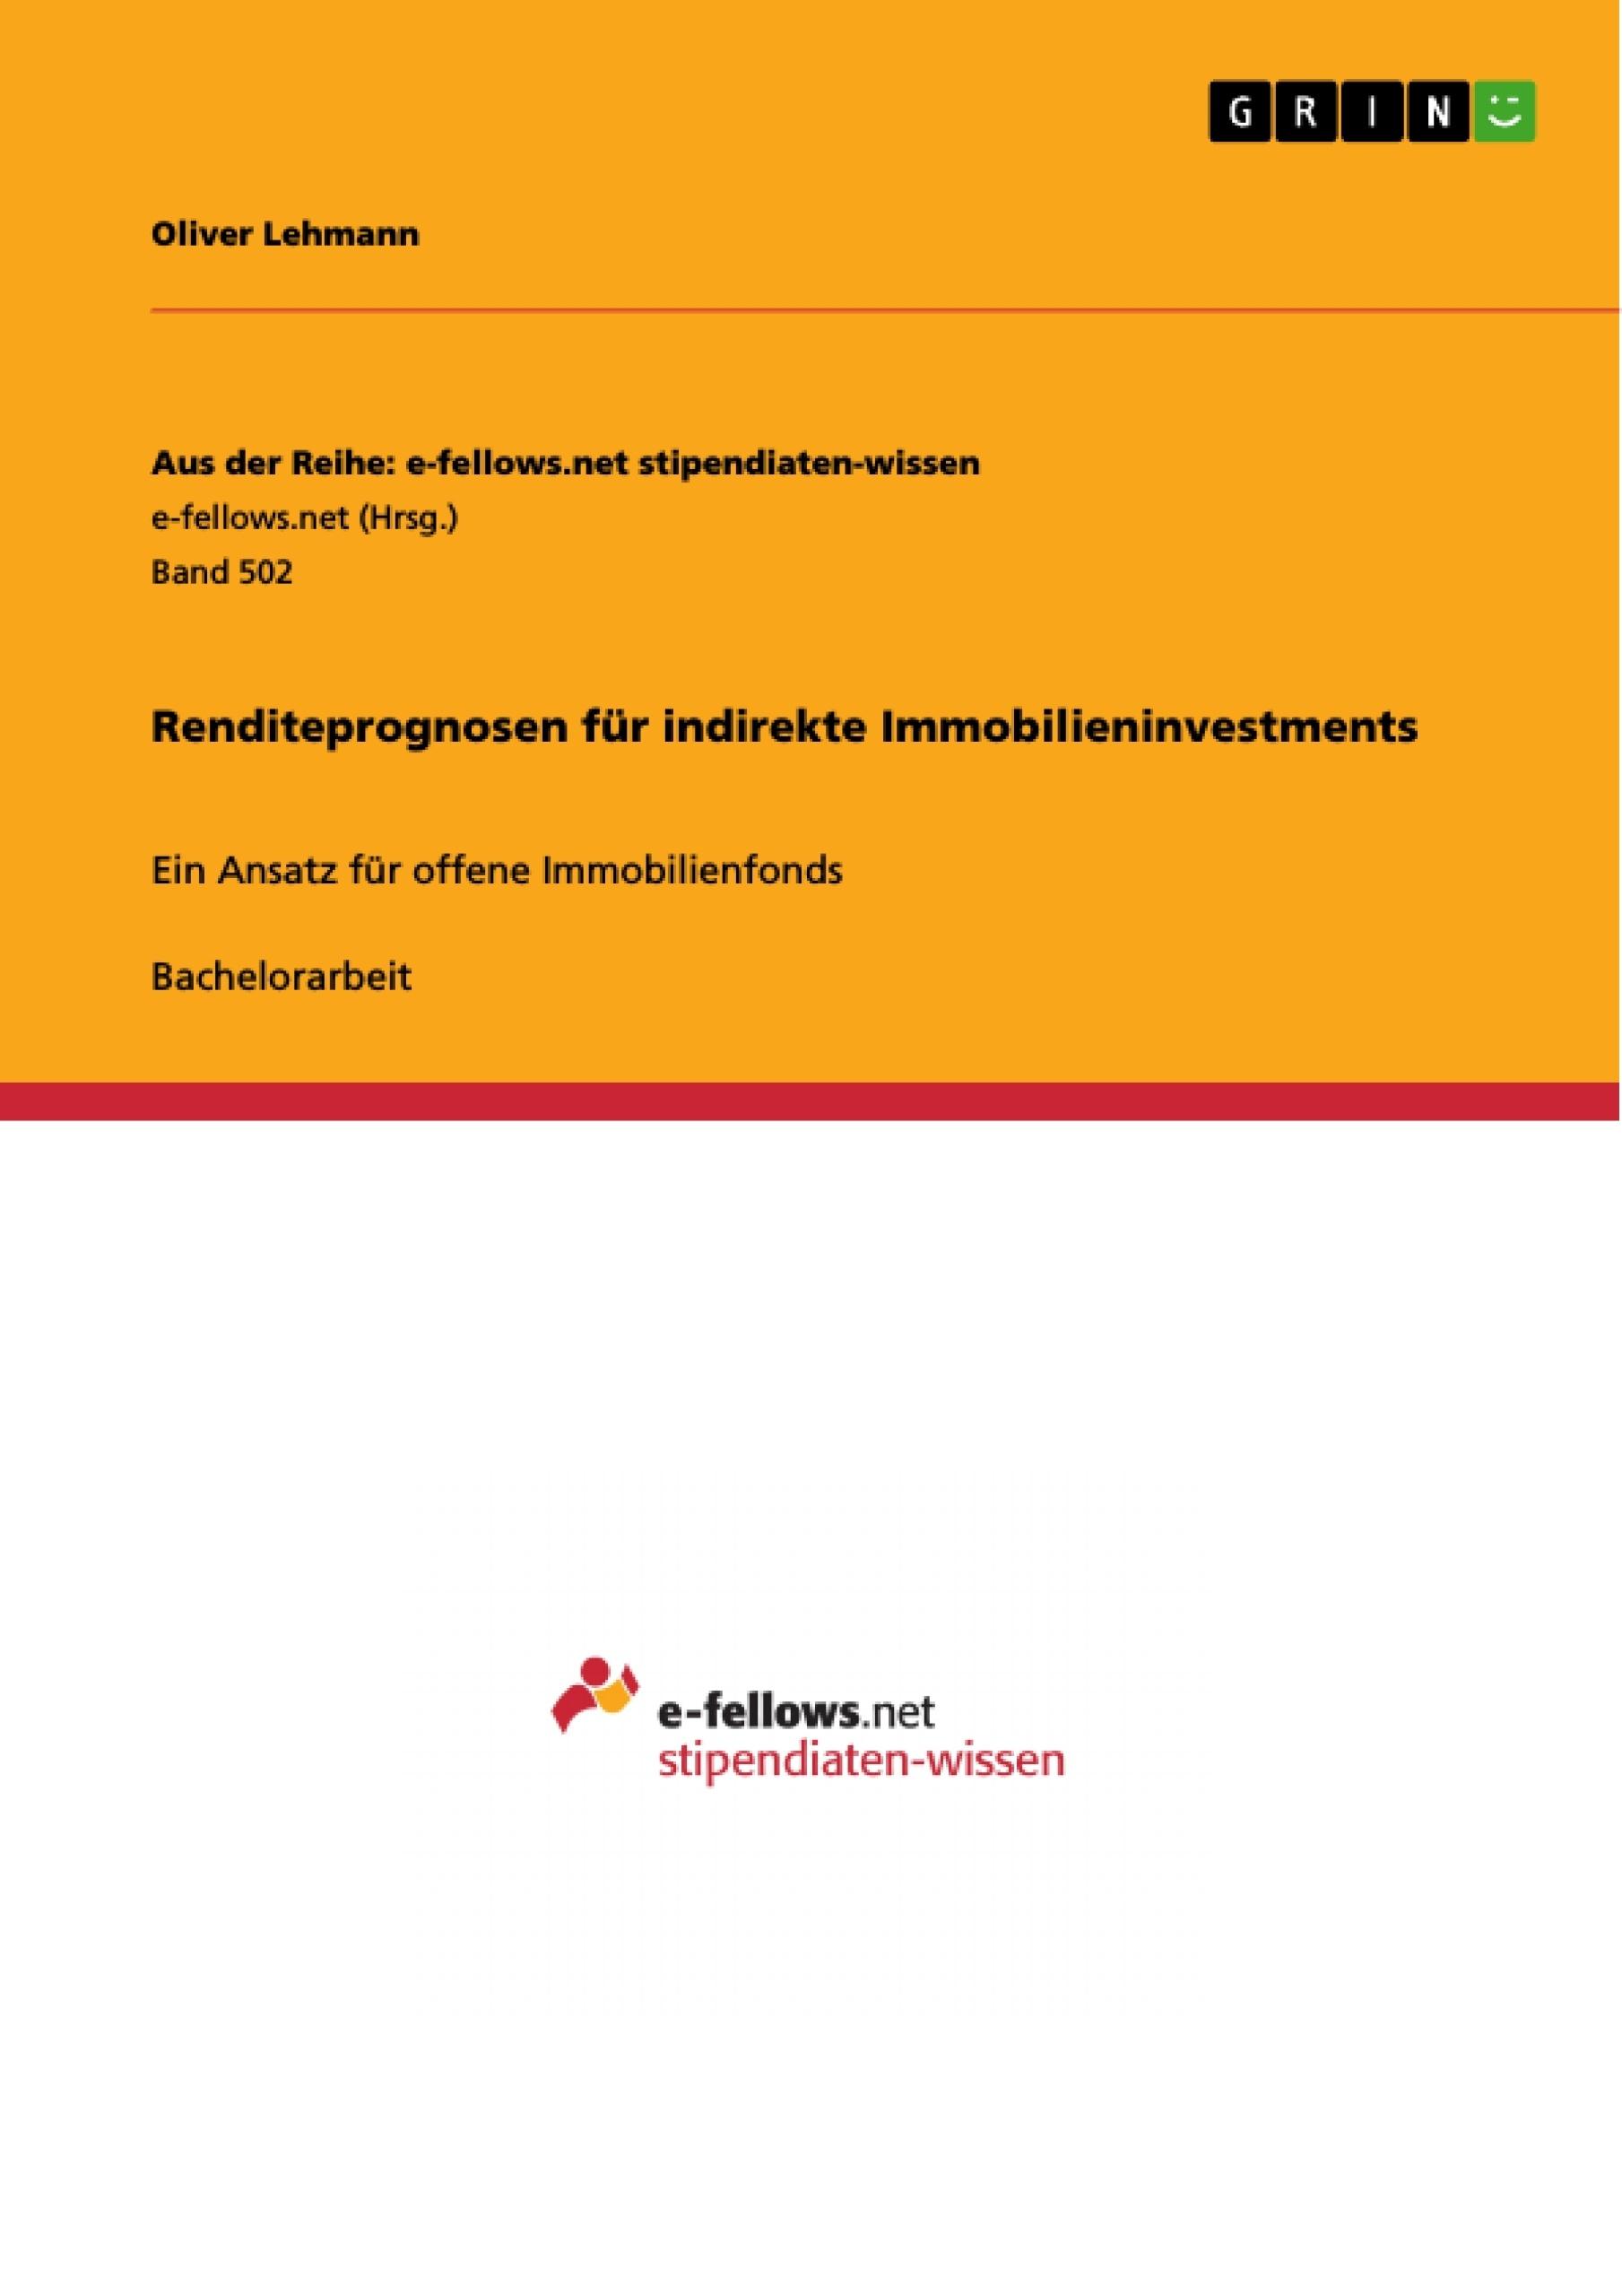 Bachelorarbeit immobilien portfoliomanagement mba proqrami